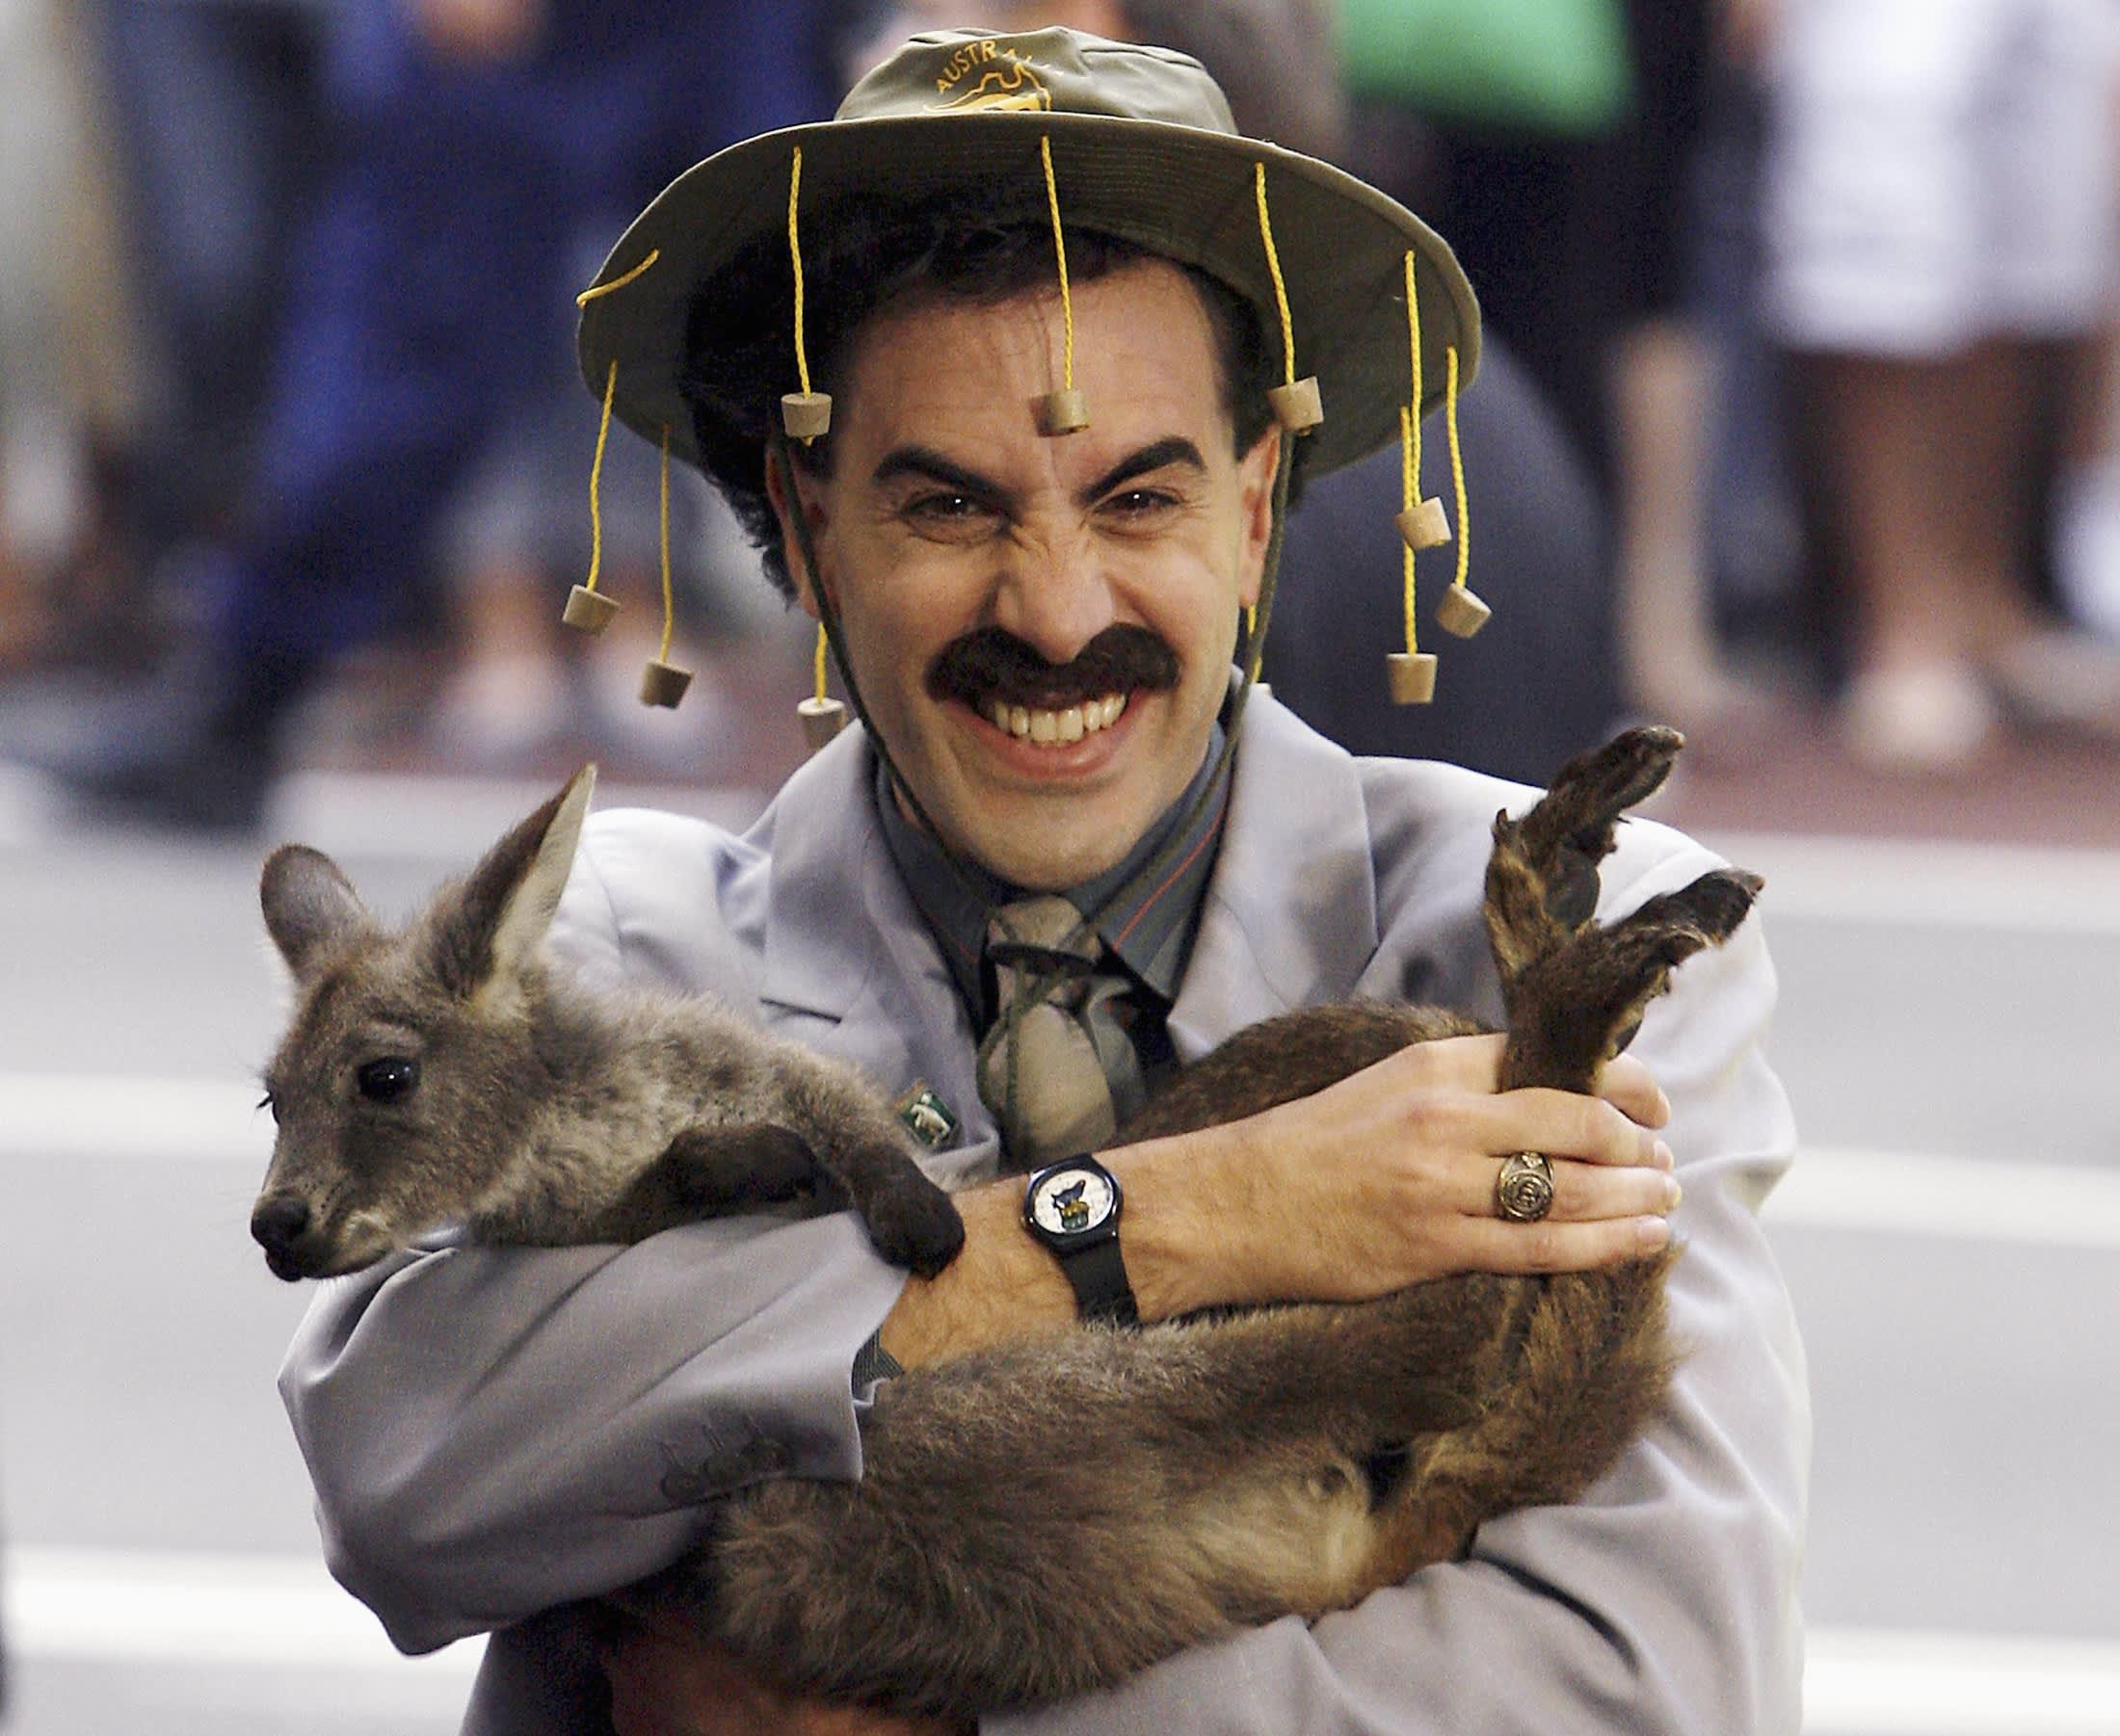 Borat actor: Facebook, Google, Youtube and Twitter are 'greatest propaganda machine in history'